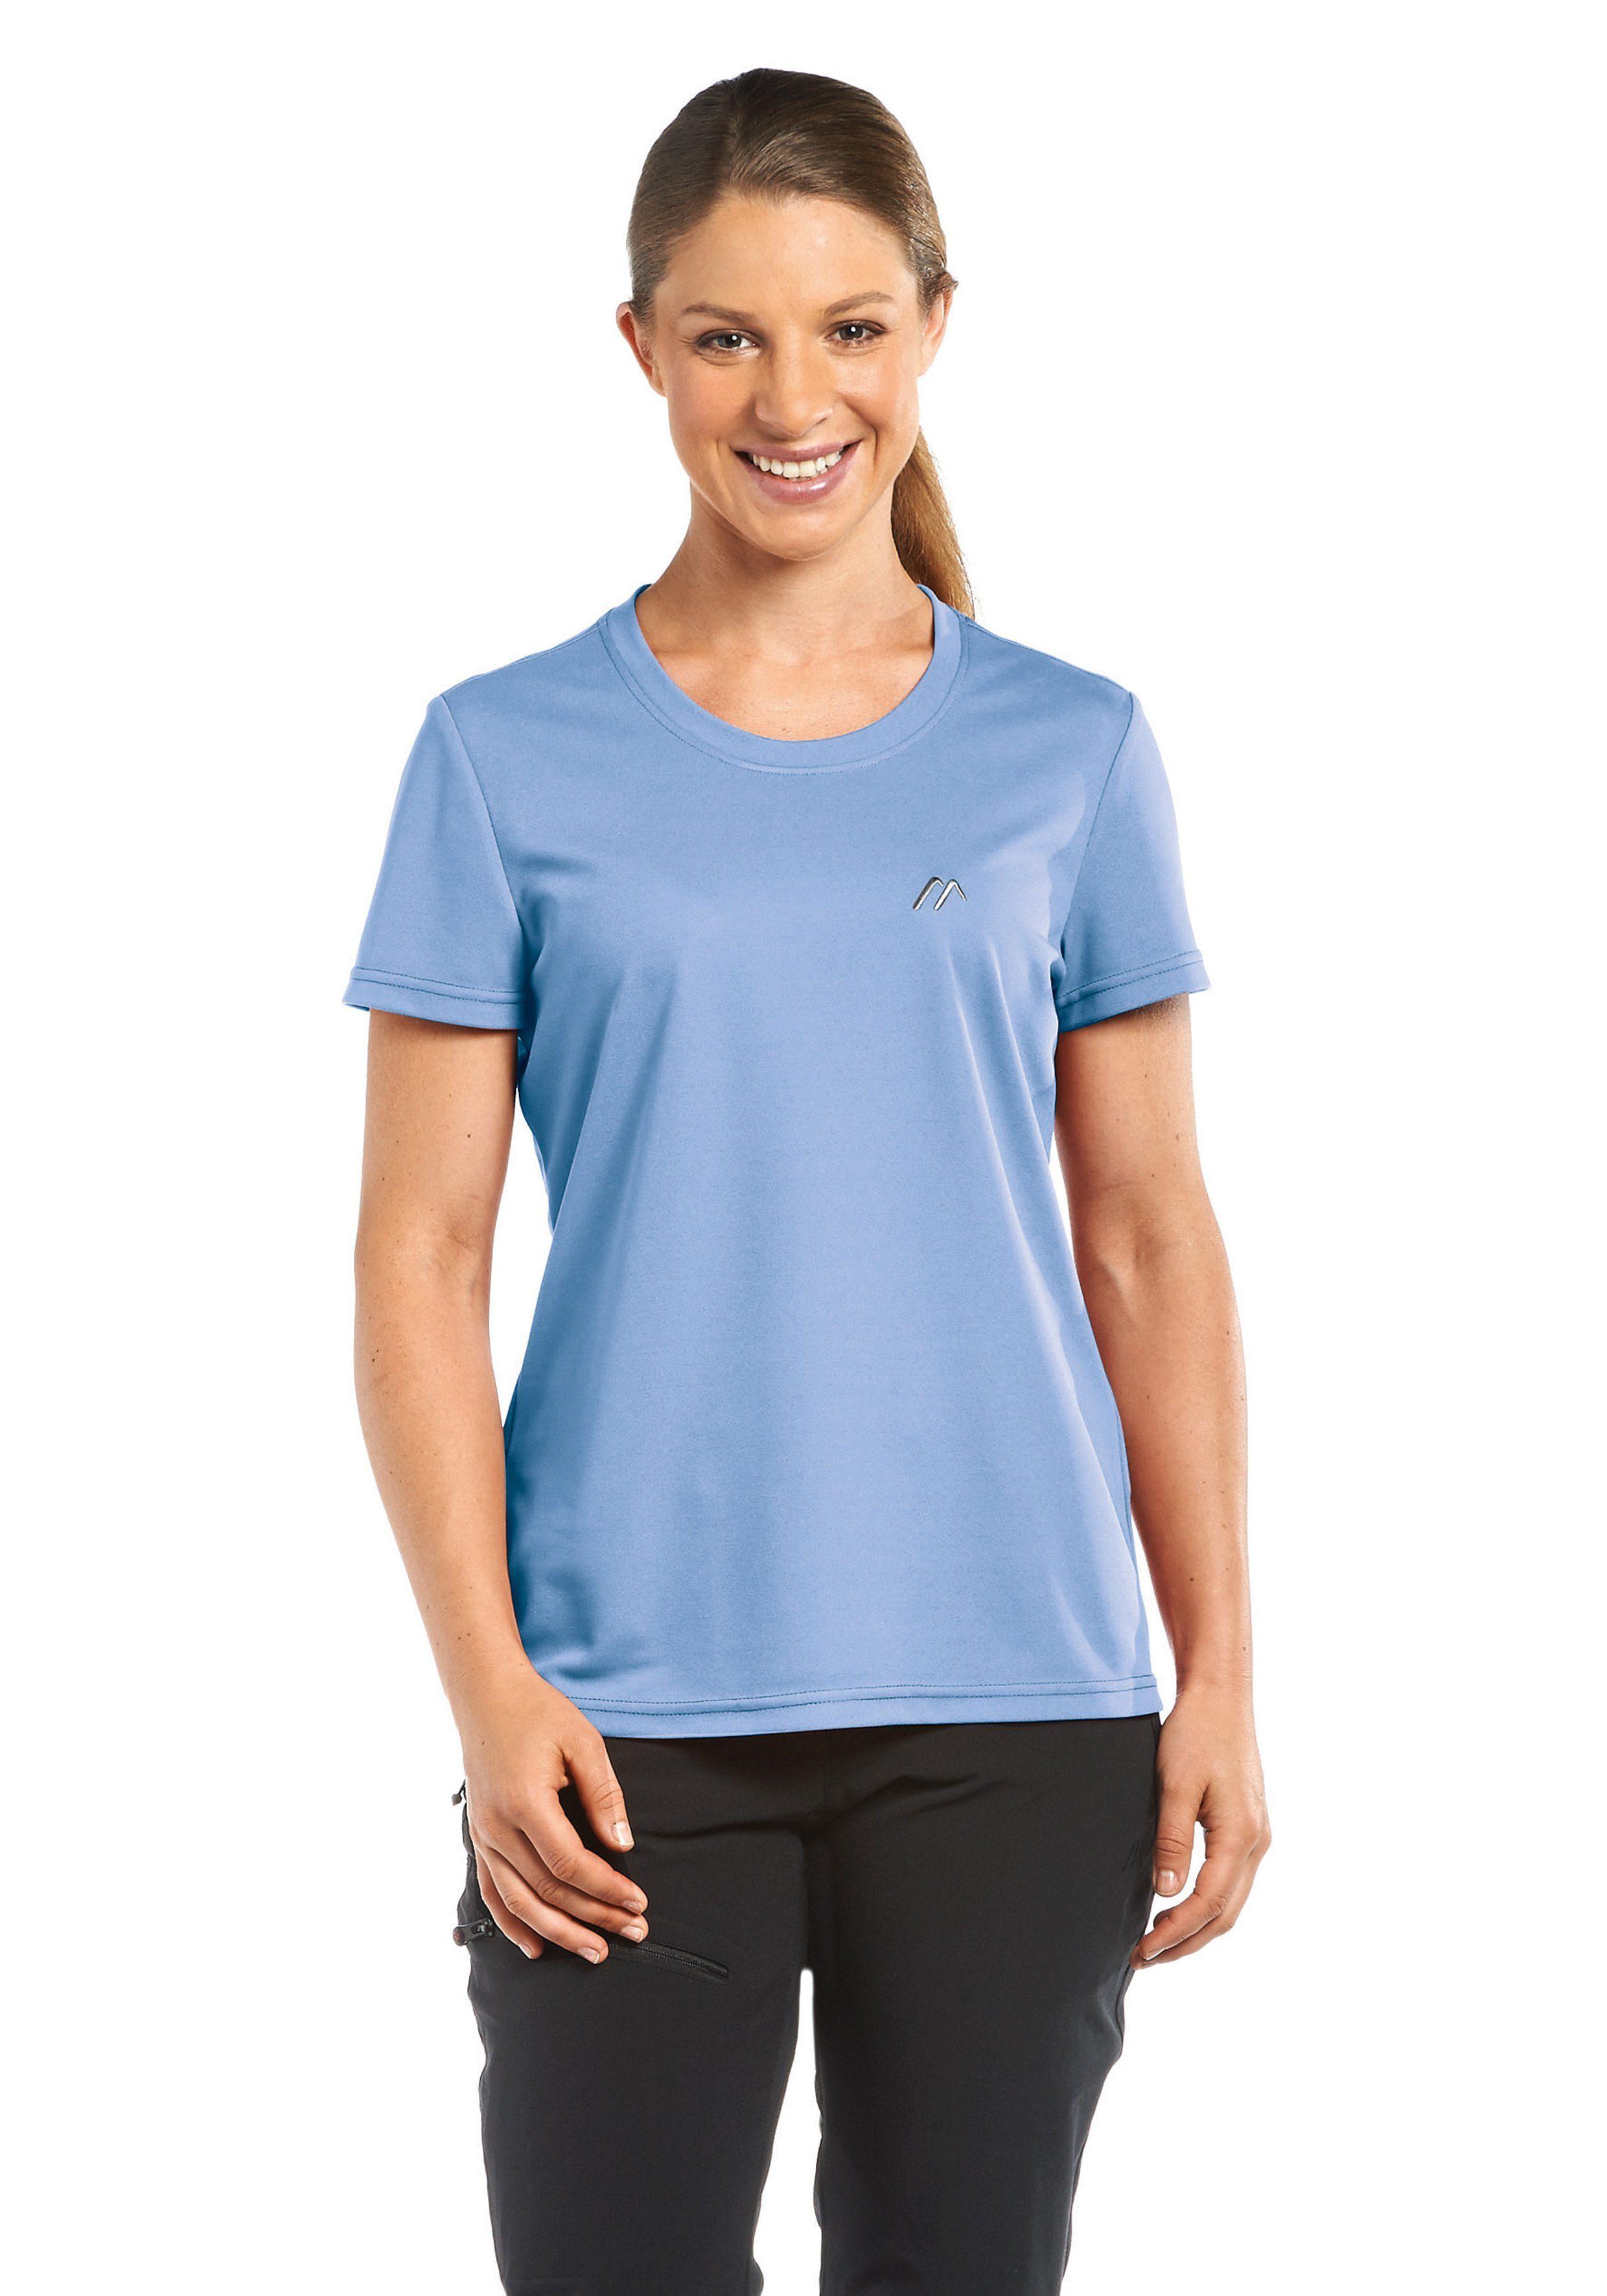 Maier Sports Funktionsshirt Waltraud   Bekleidung > Shirts > Funktionsshirts   Blau   Maier Sports